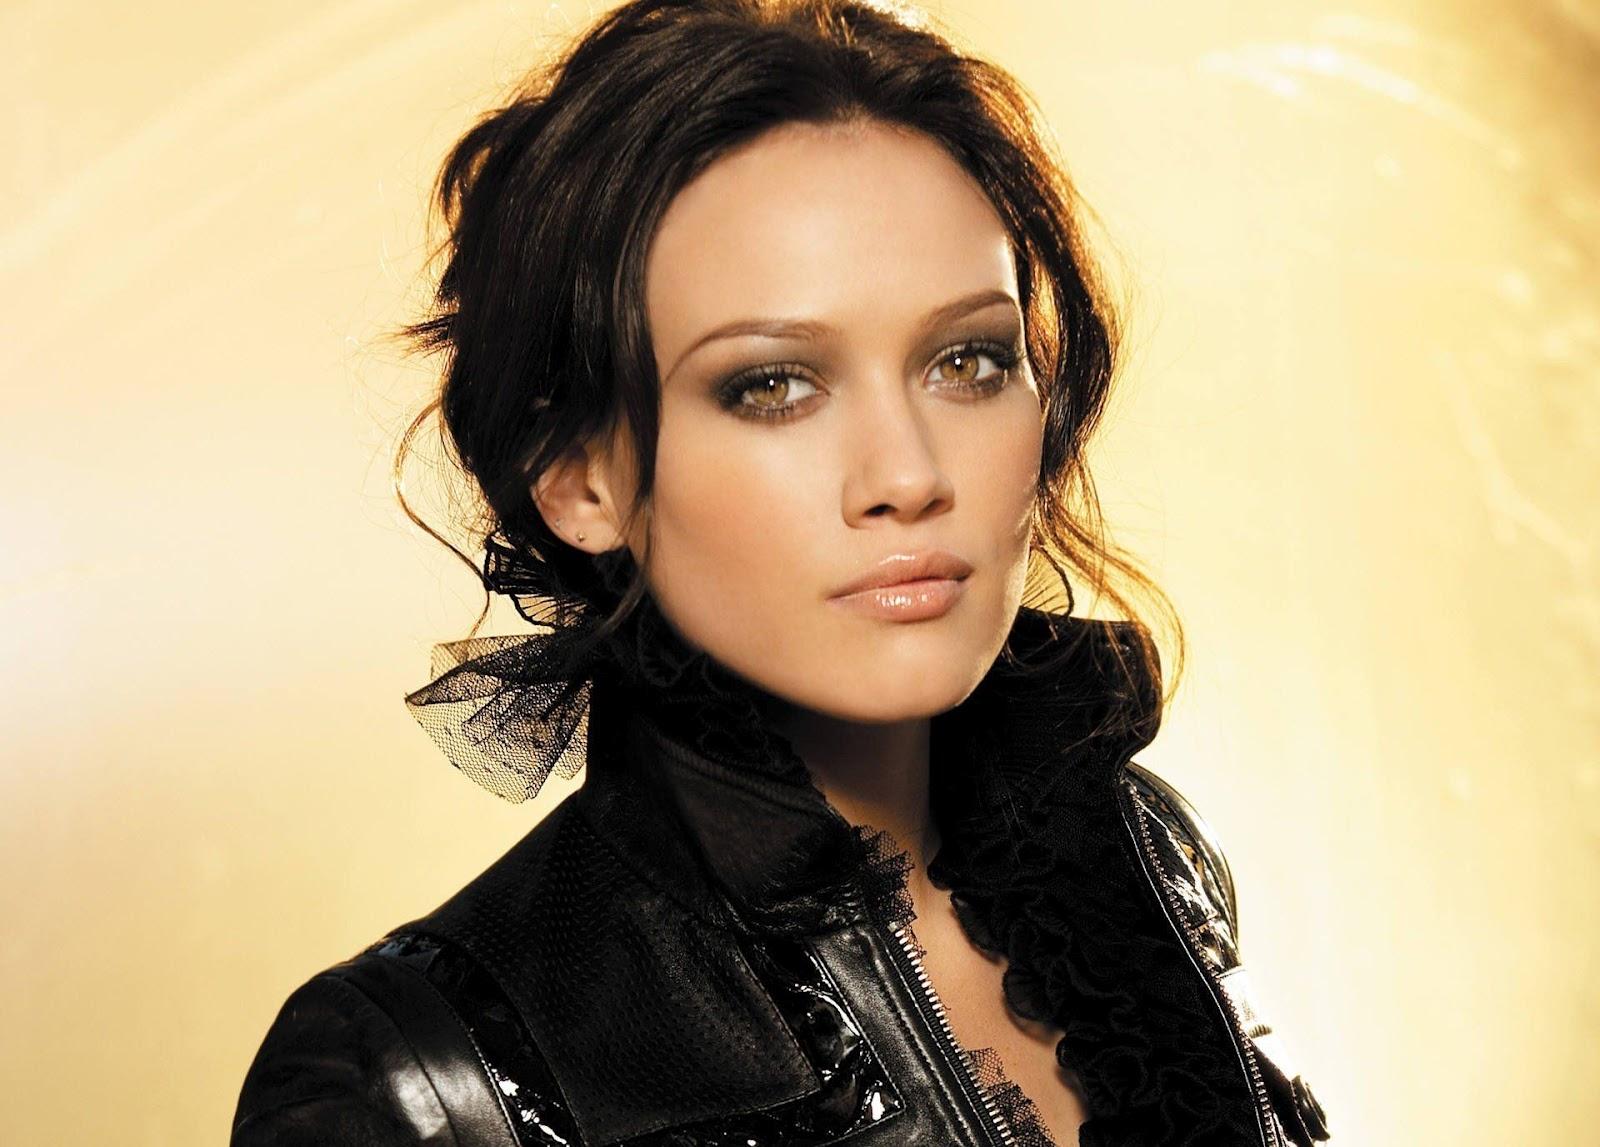 hollywood female stars recent - photo #39